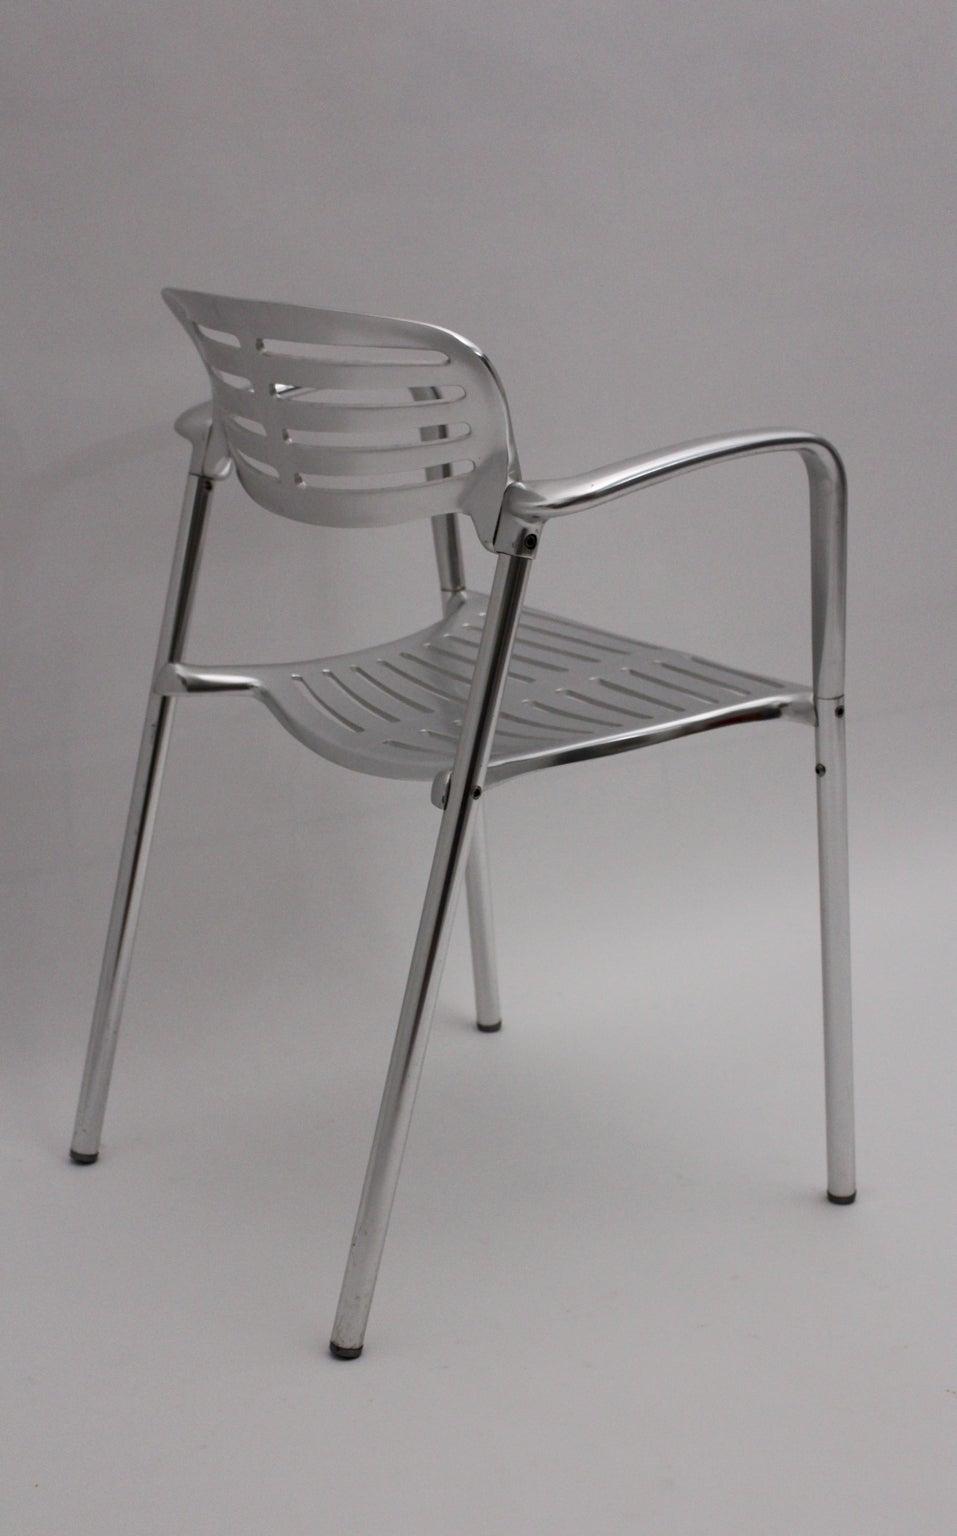 Modernist Metal Vintage Chairs Toledo by Jorge Pensi  Spain 1986-1988 For Sale 2